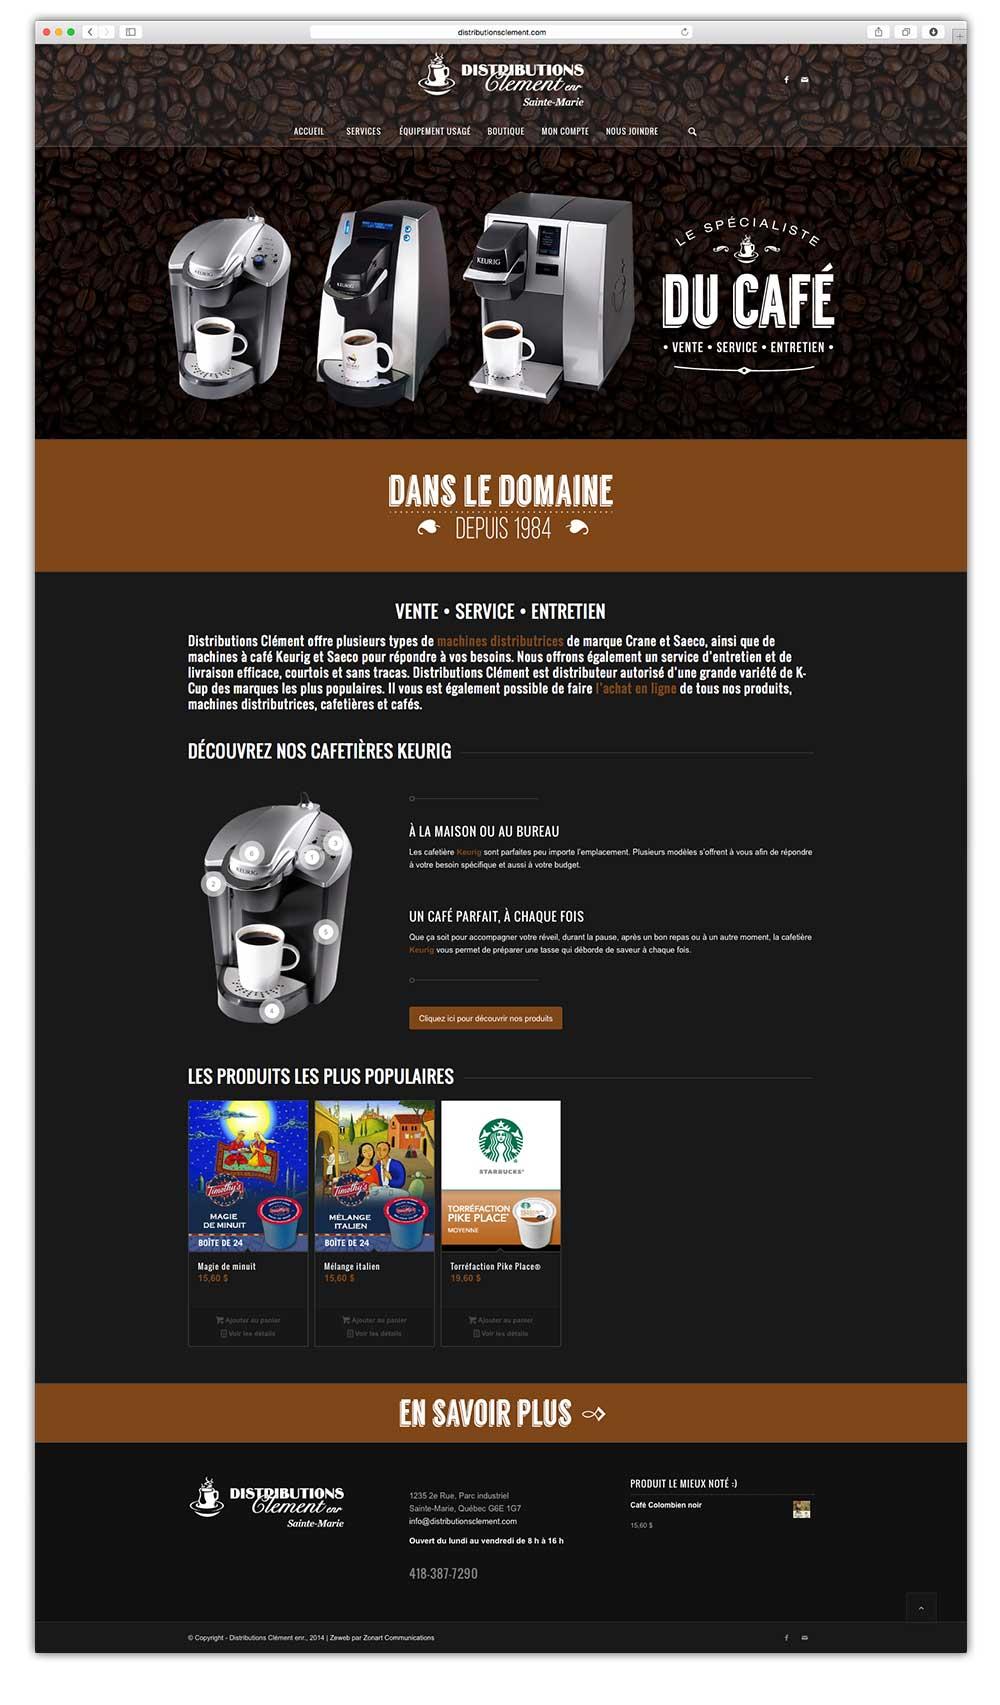 Distributions Clément - web - ecommerce | Design by Kaylynne Johnson - web & design | www.kaylynnejohnson.com